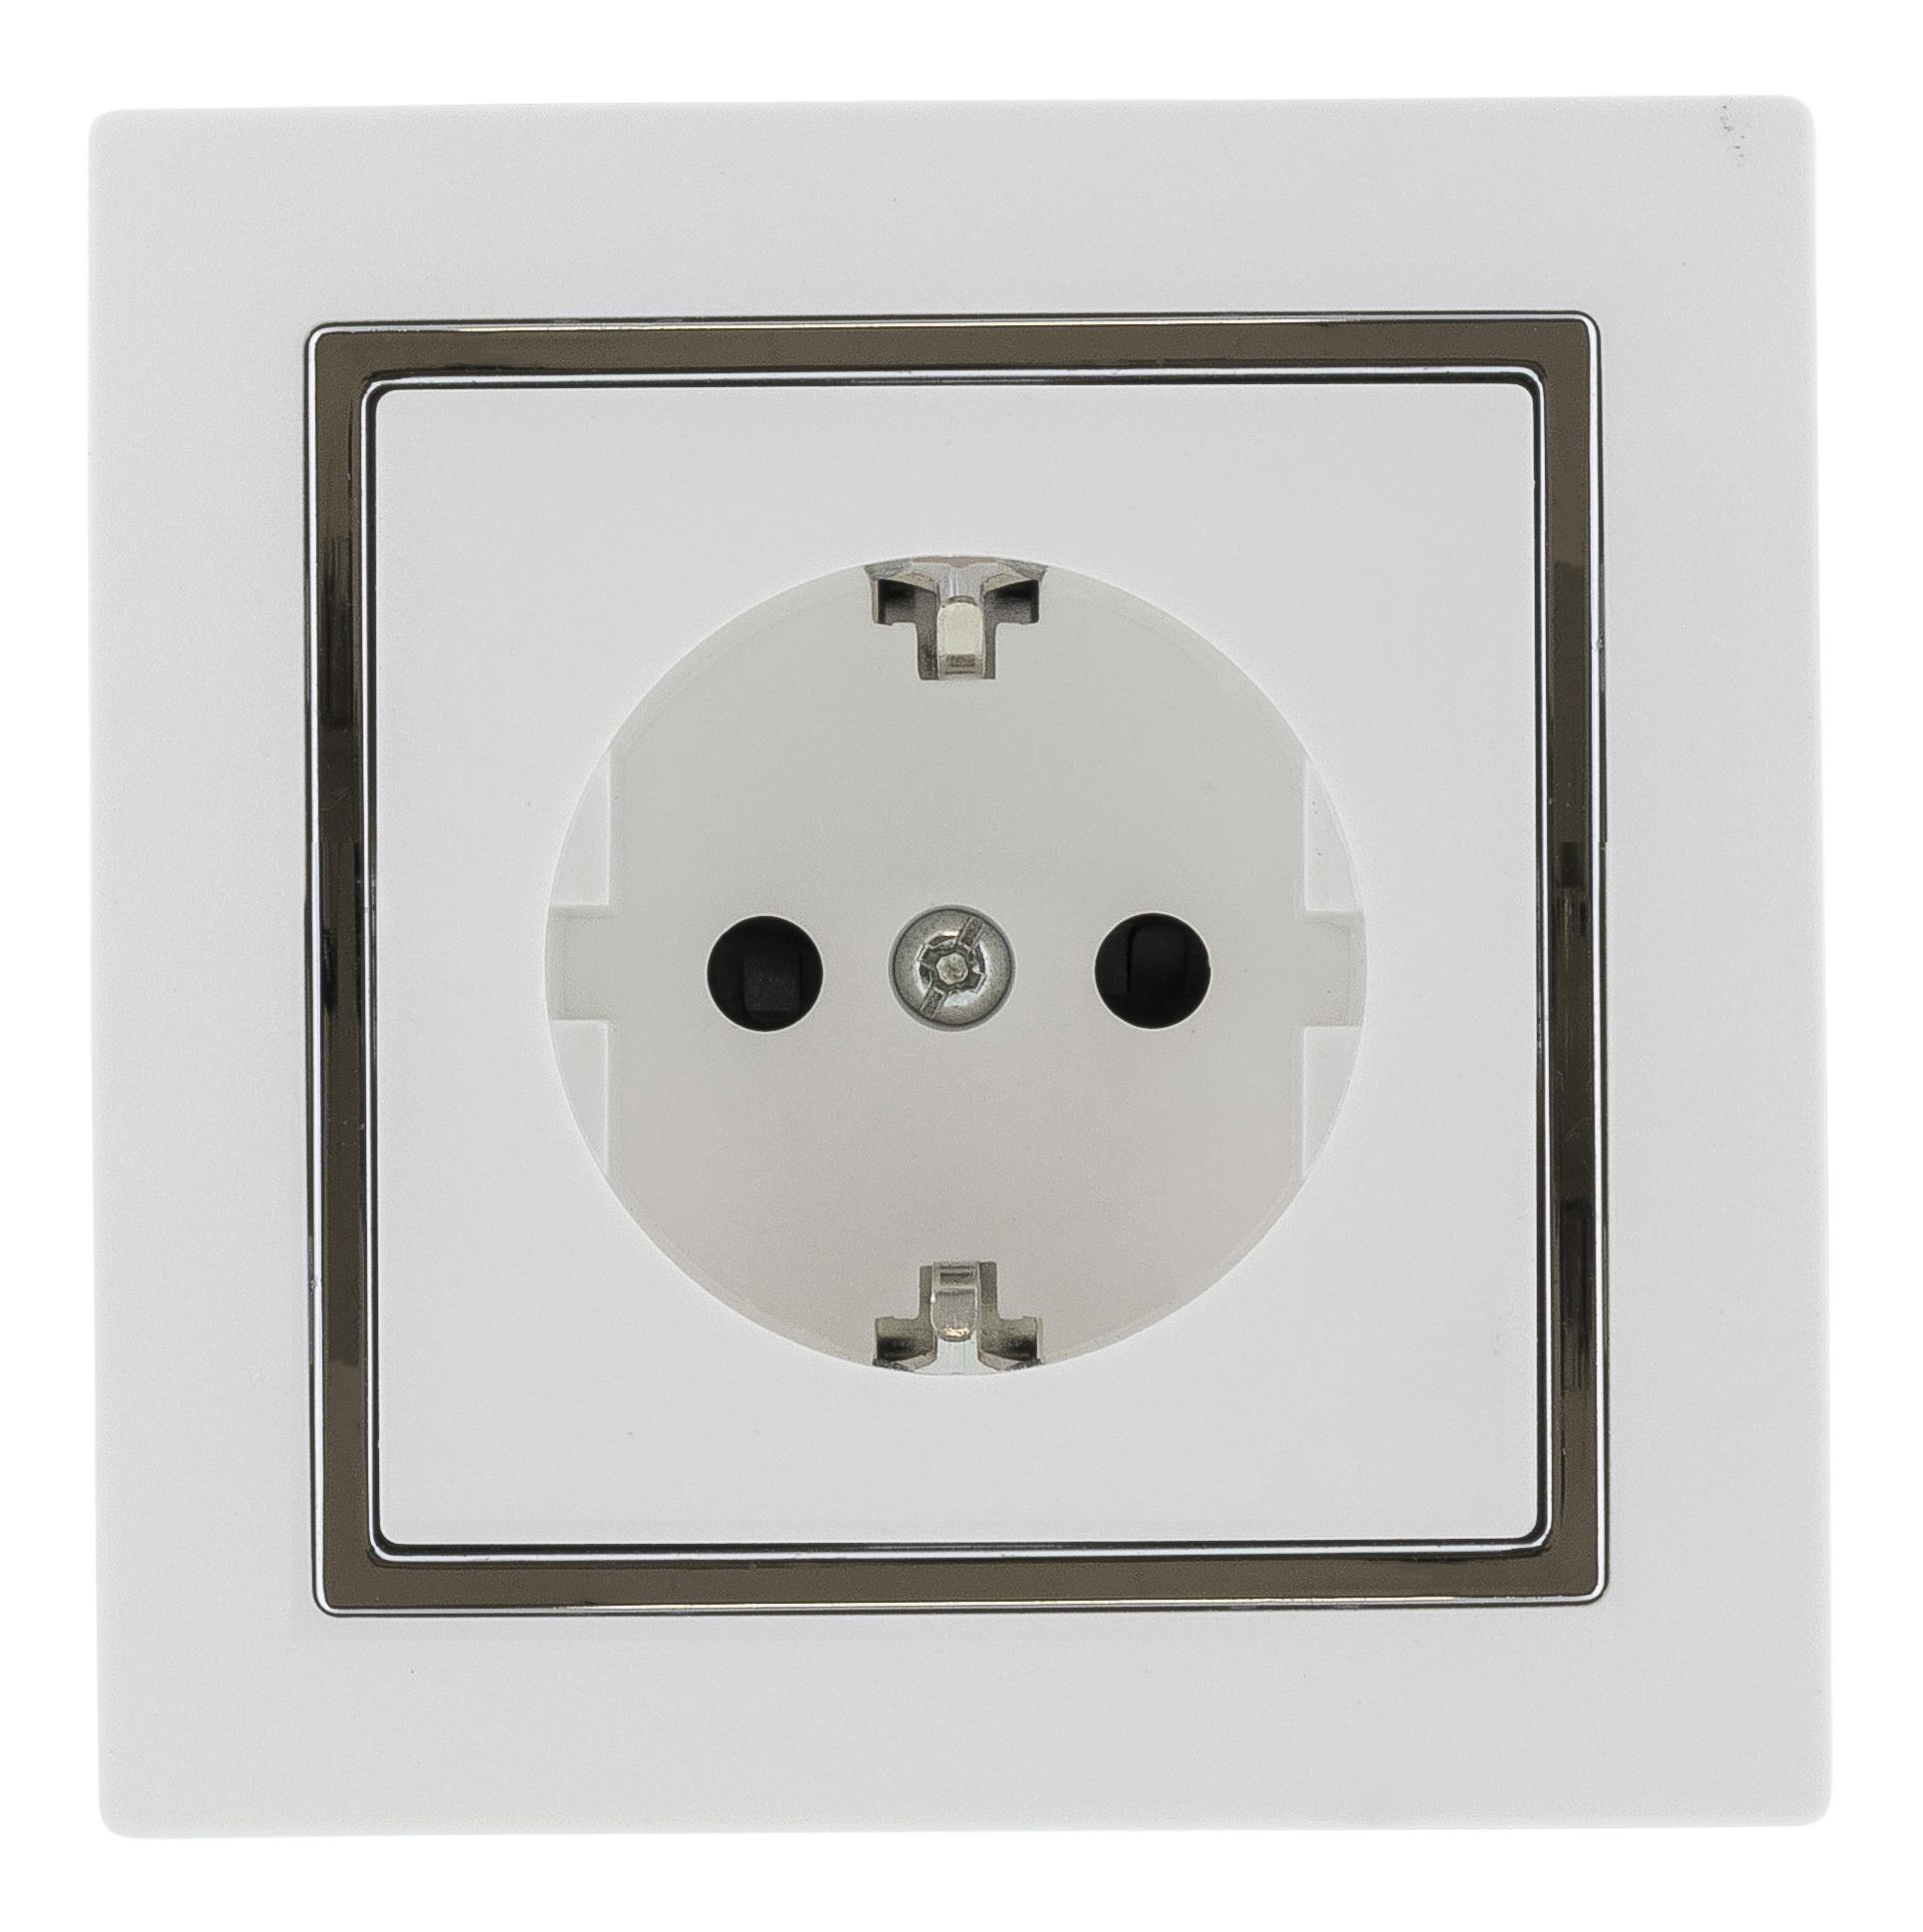 Epzi one-way socket for flush mounting in appliance box, white H1-H51GM (Kan sendes i brev)